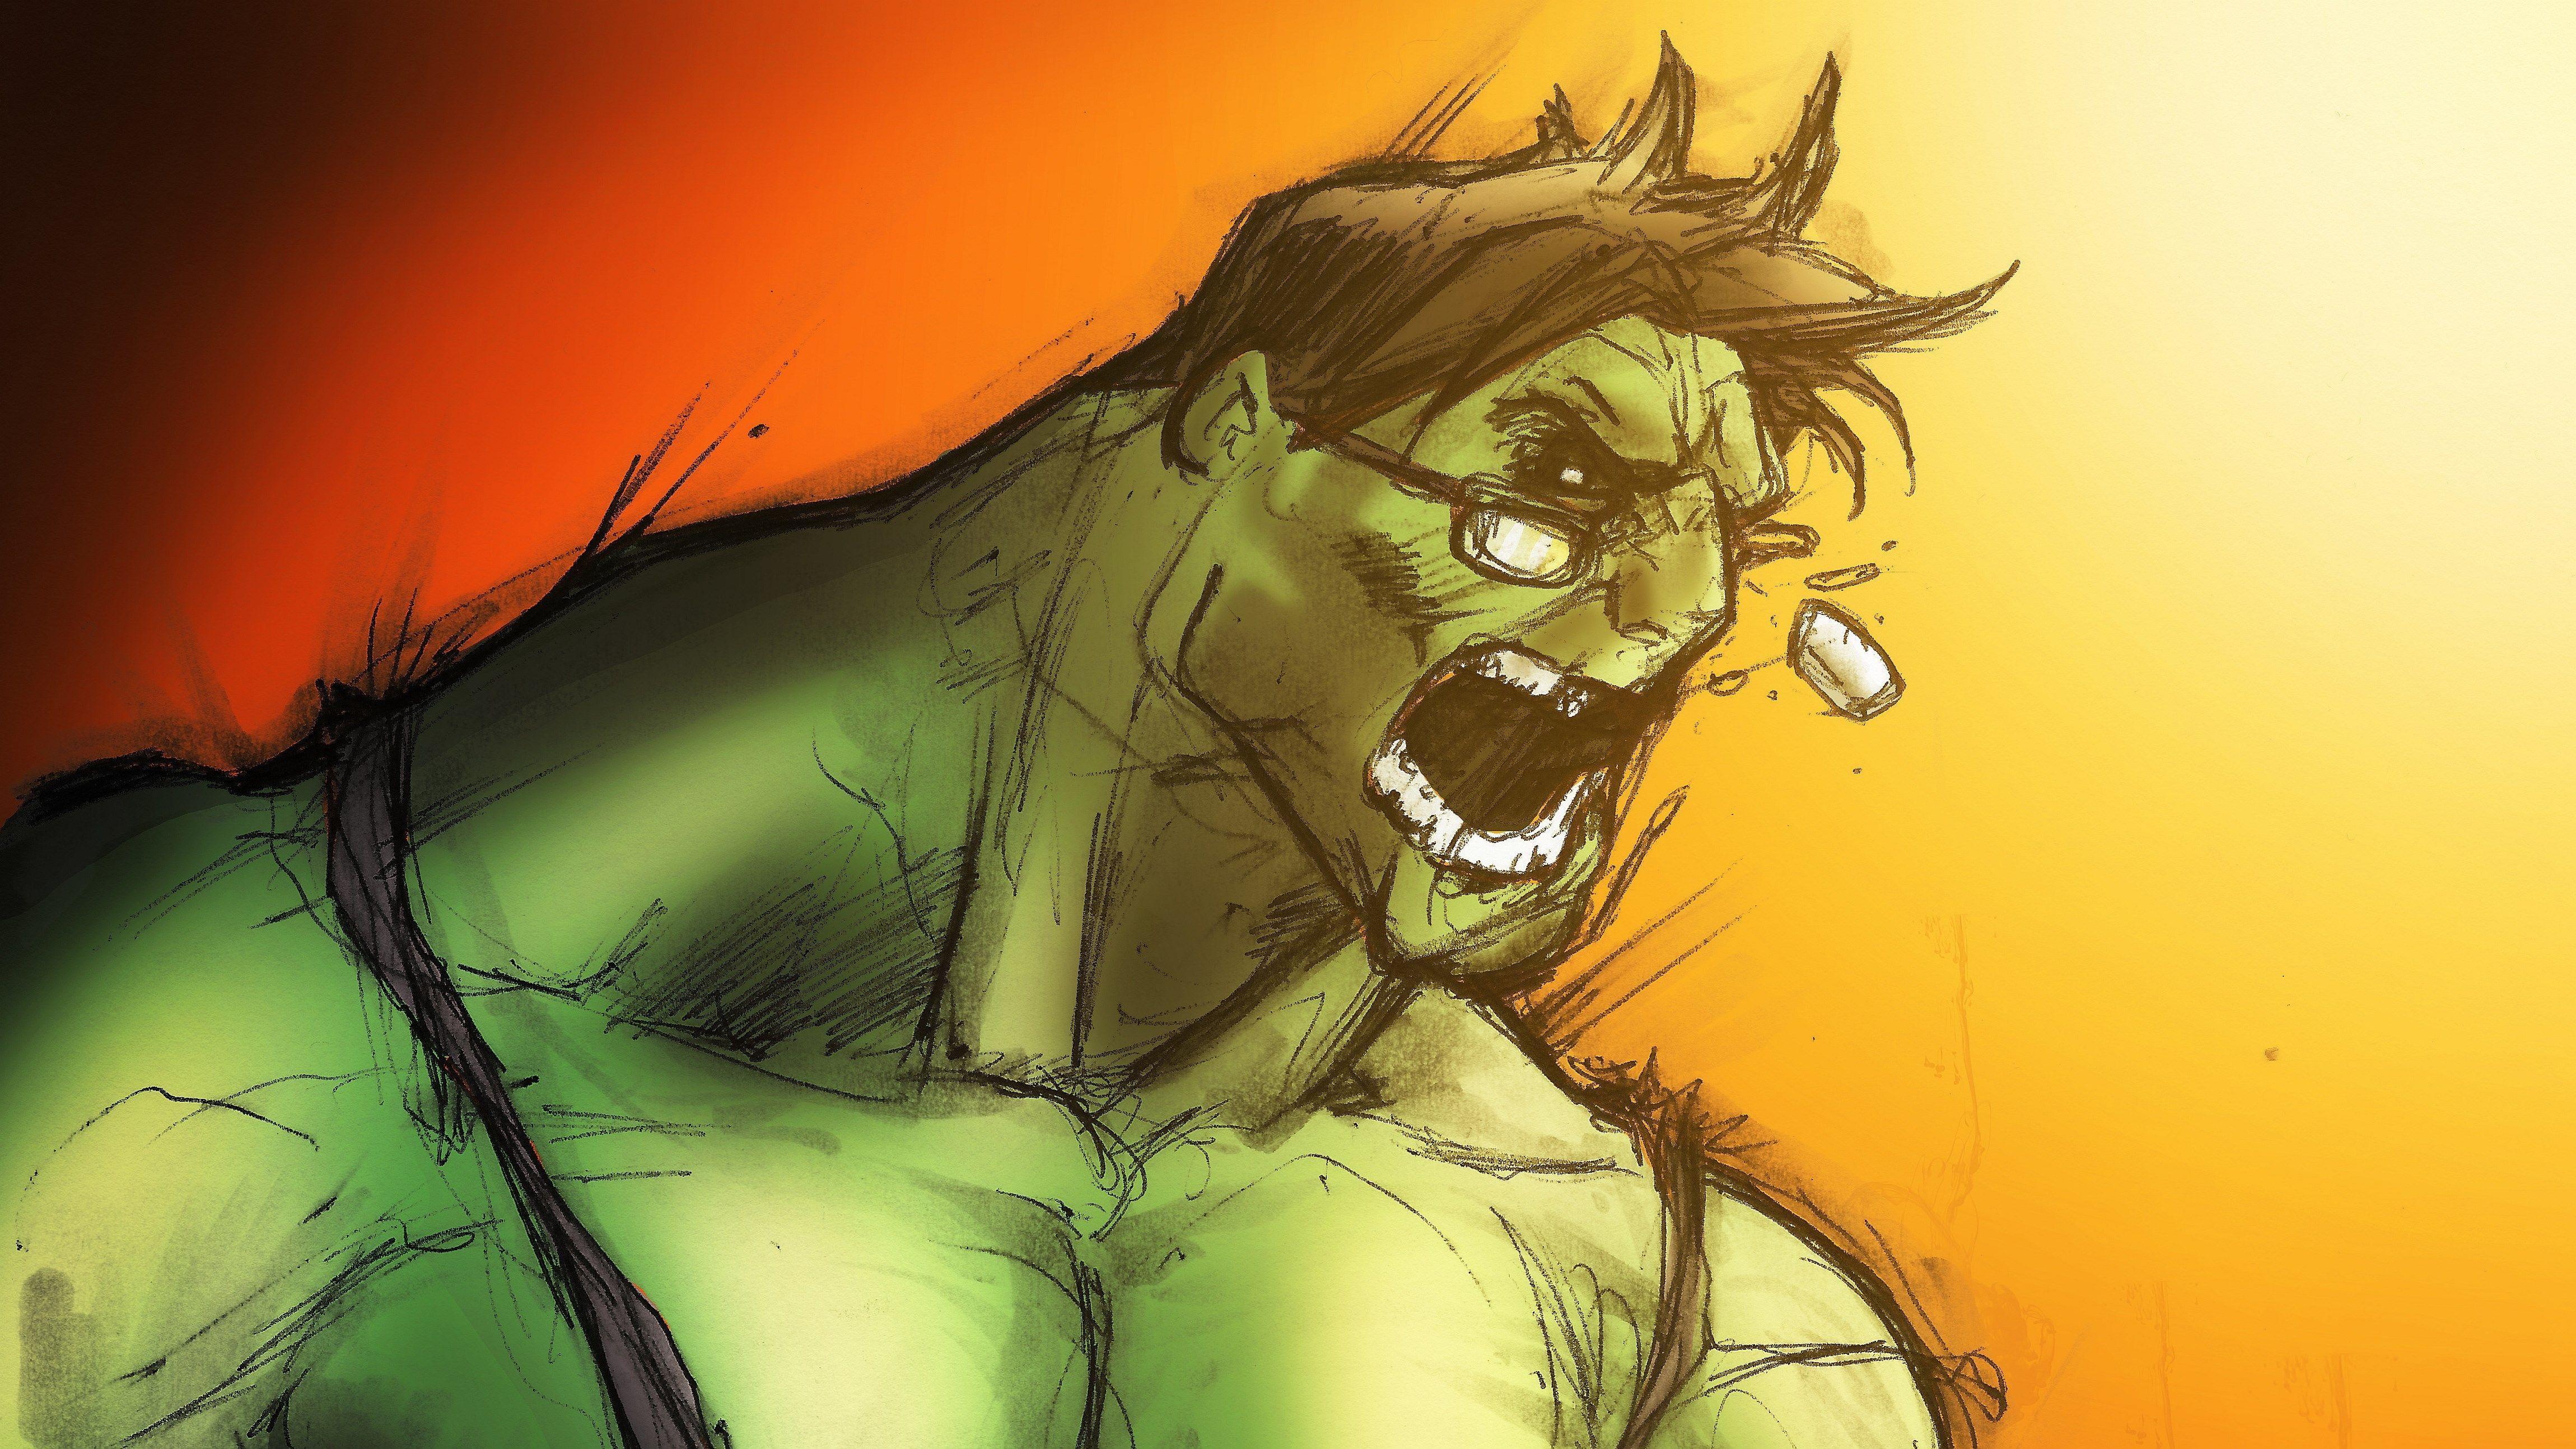 Hulk 4K Ultra HD Wallpapers - Top Free Hulk 4K Ultra HD ...